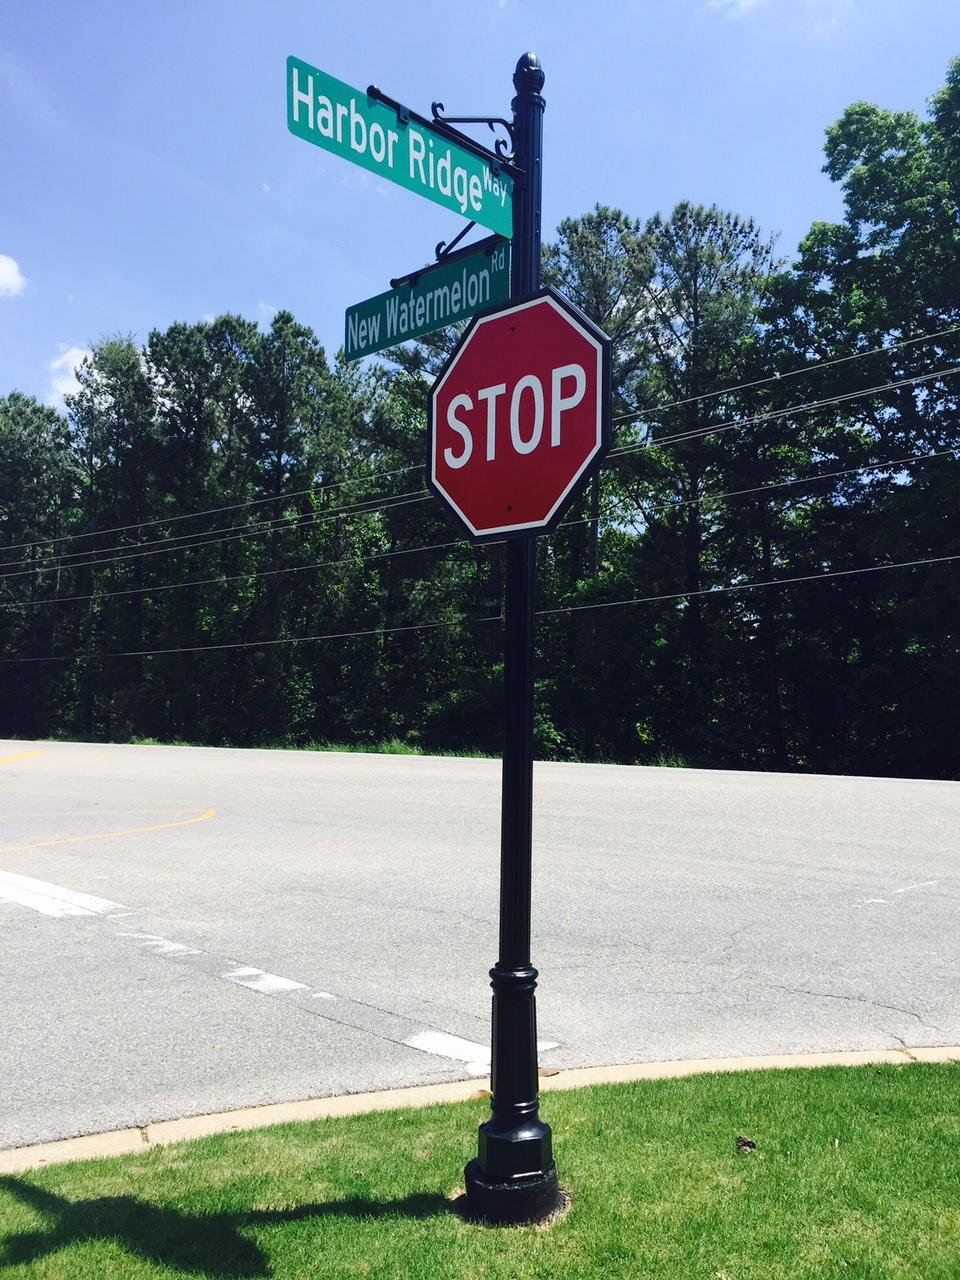 Harbor Ridge Decorative Stop Sign